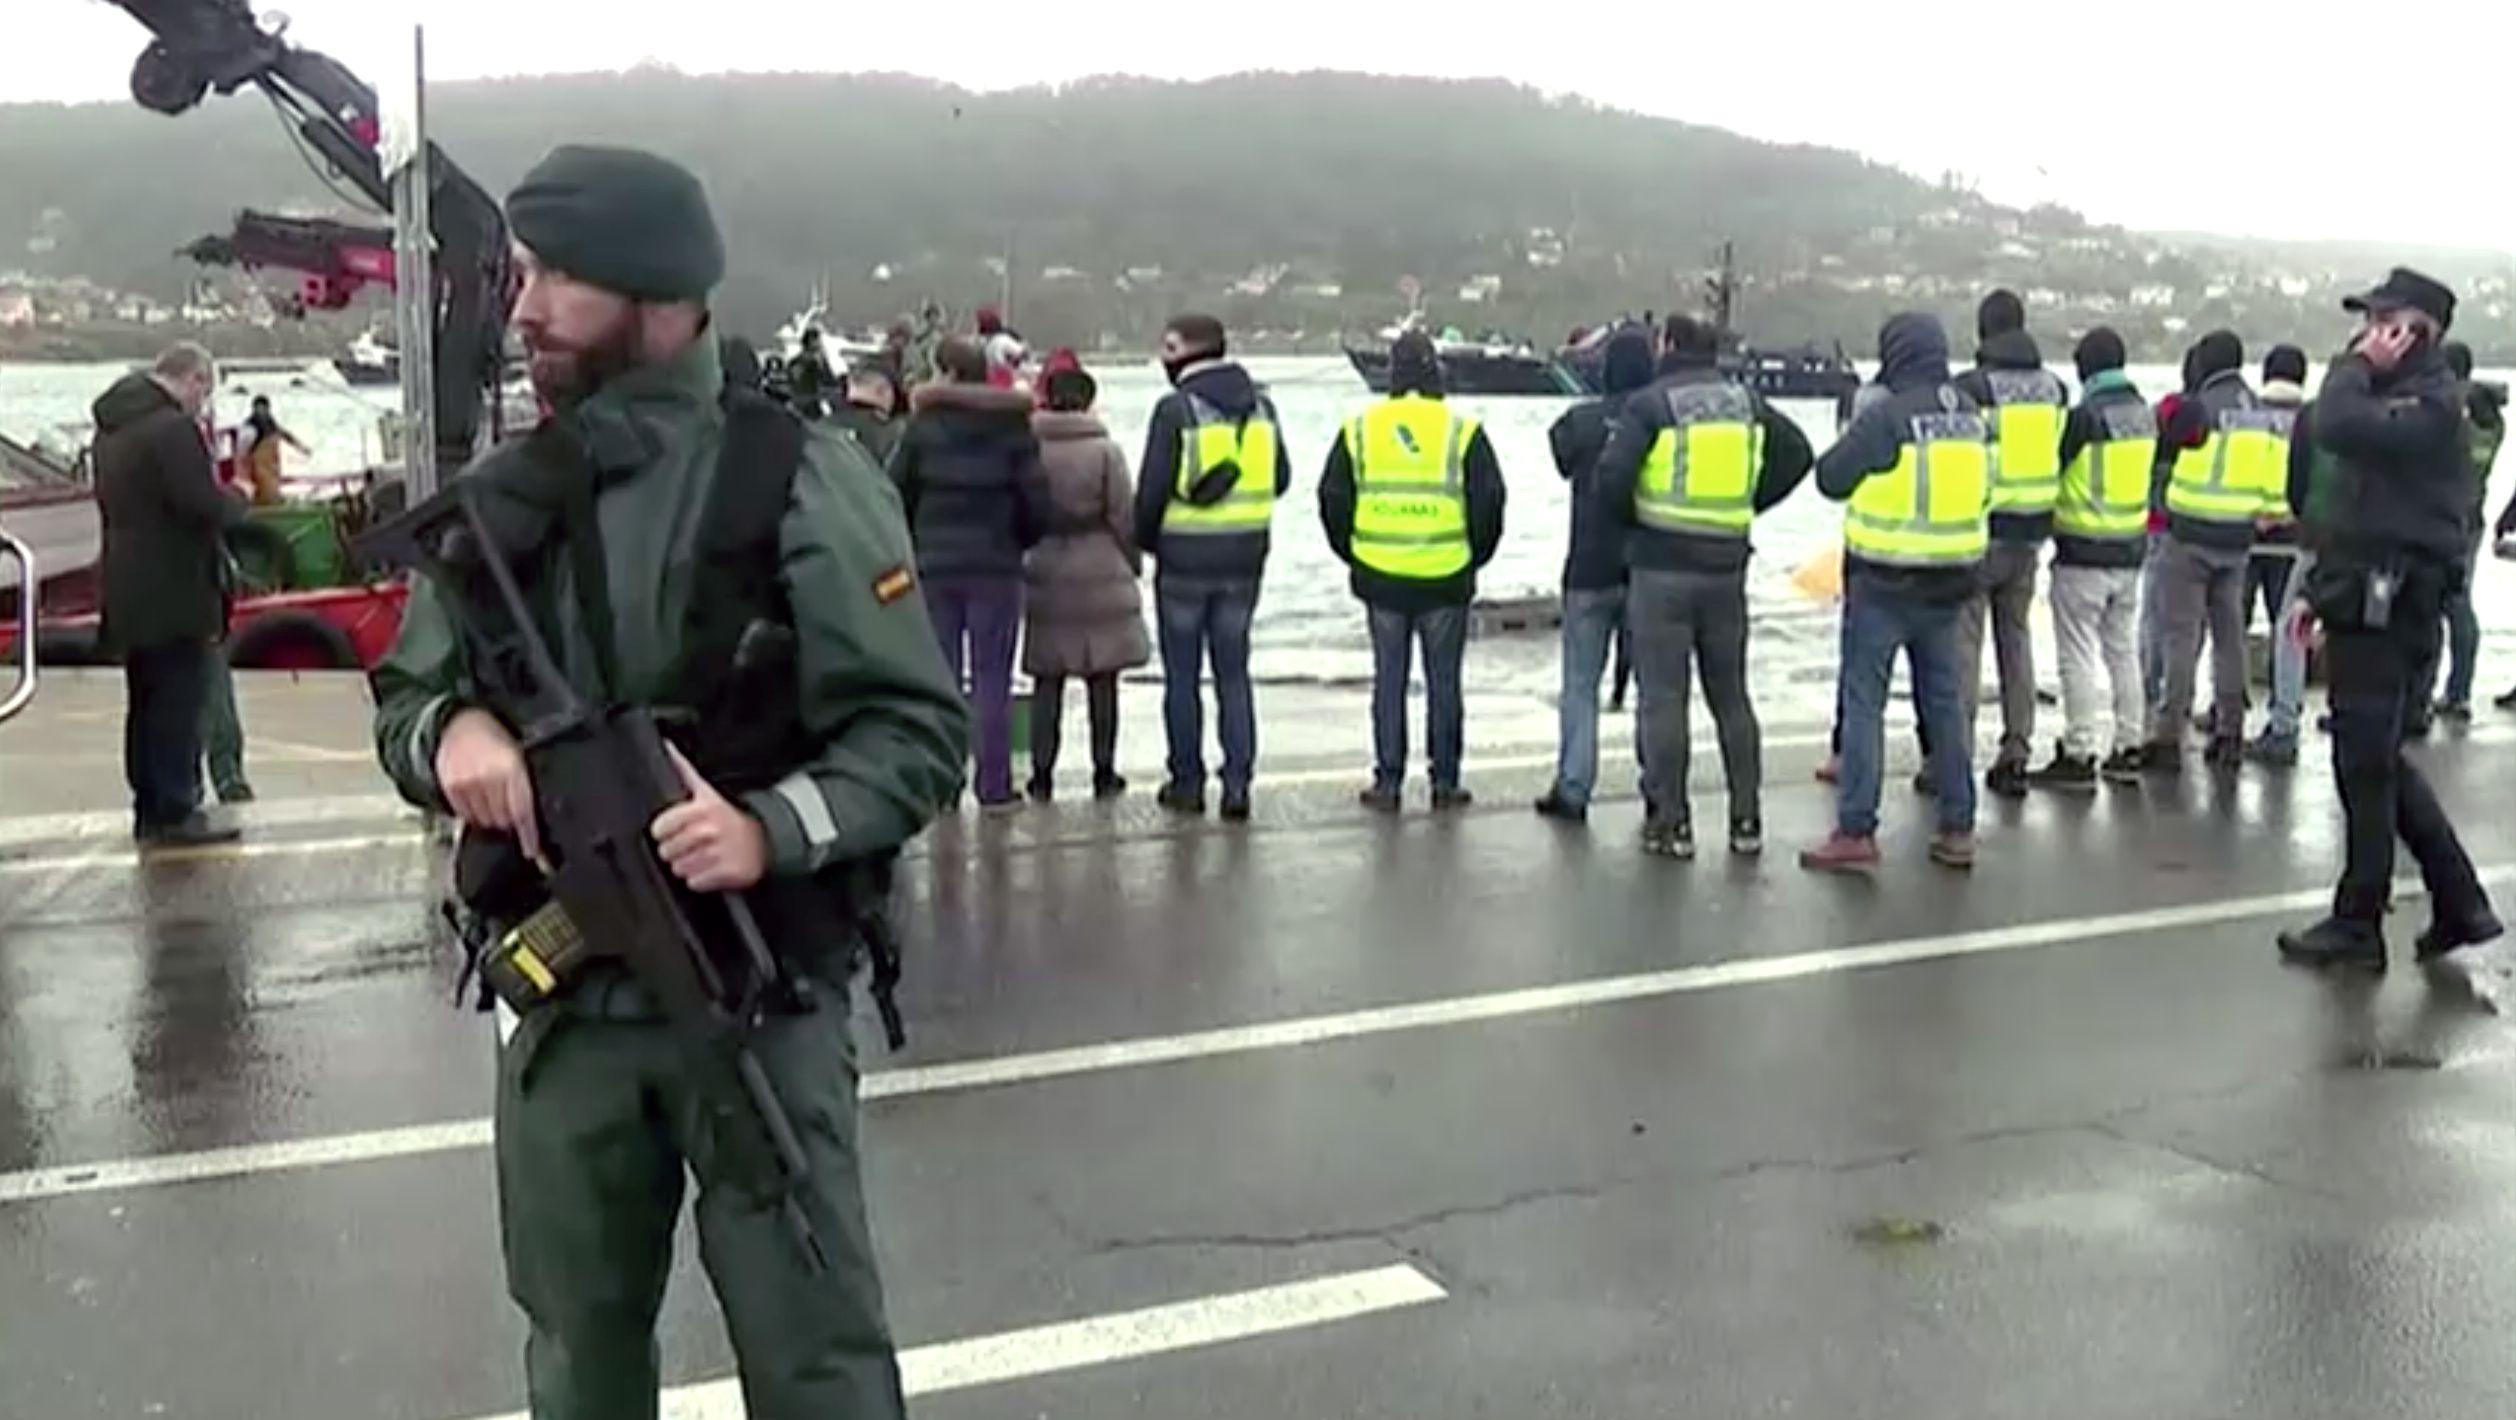 240 agentes participaron del operativo conjunto (Forta/REUTERS TV via REUTERS)